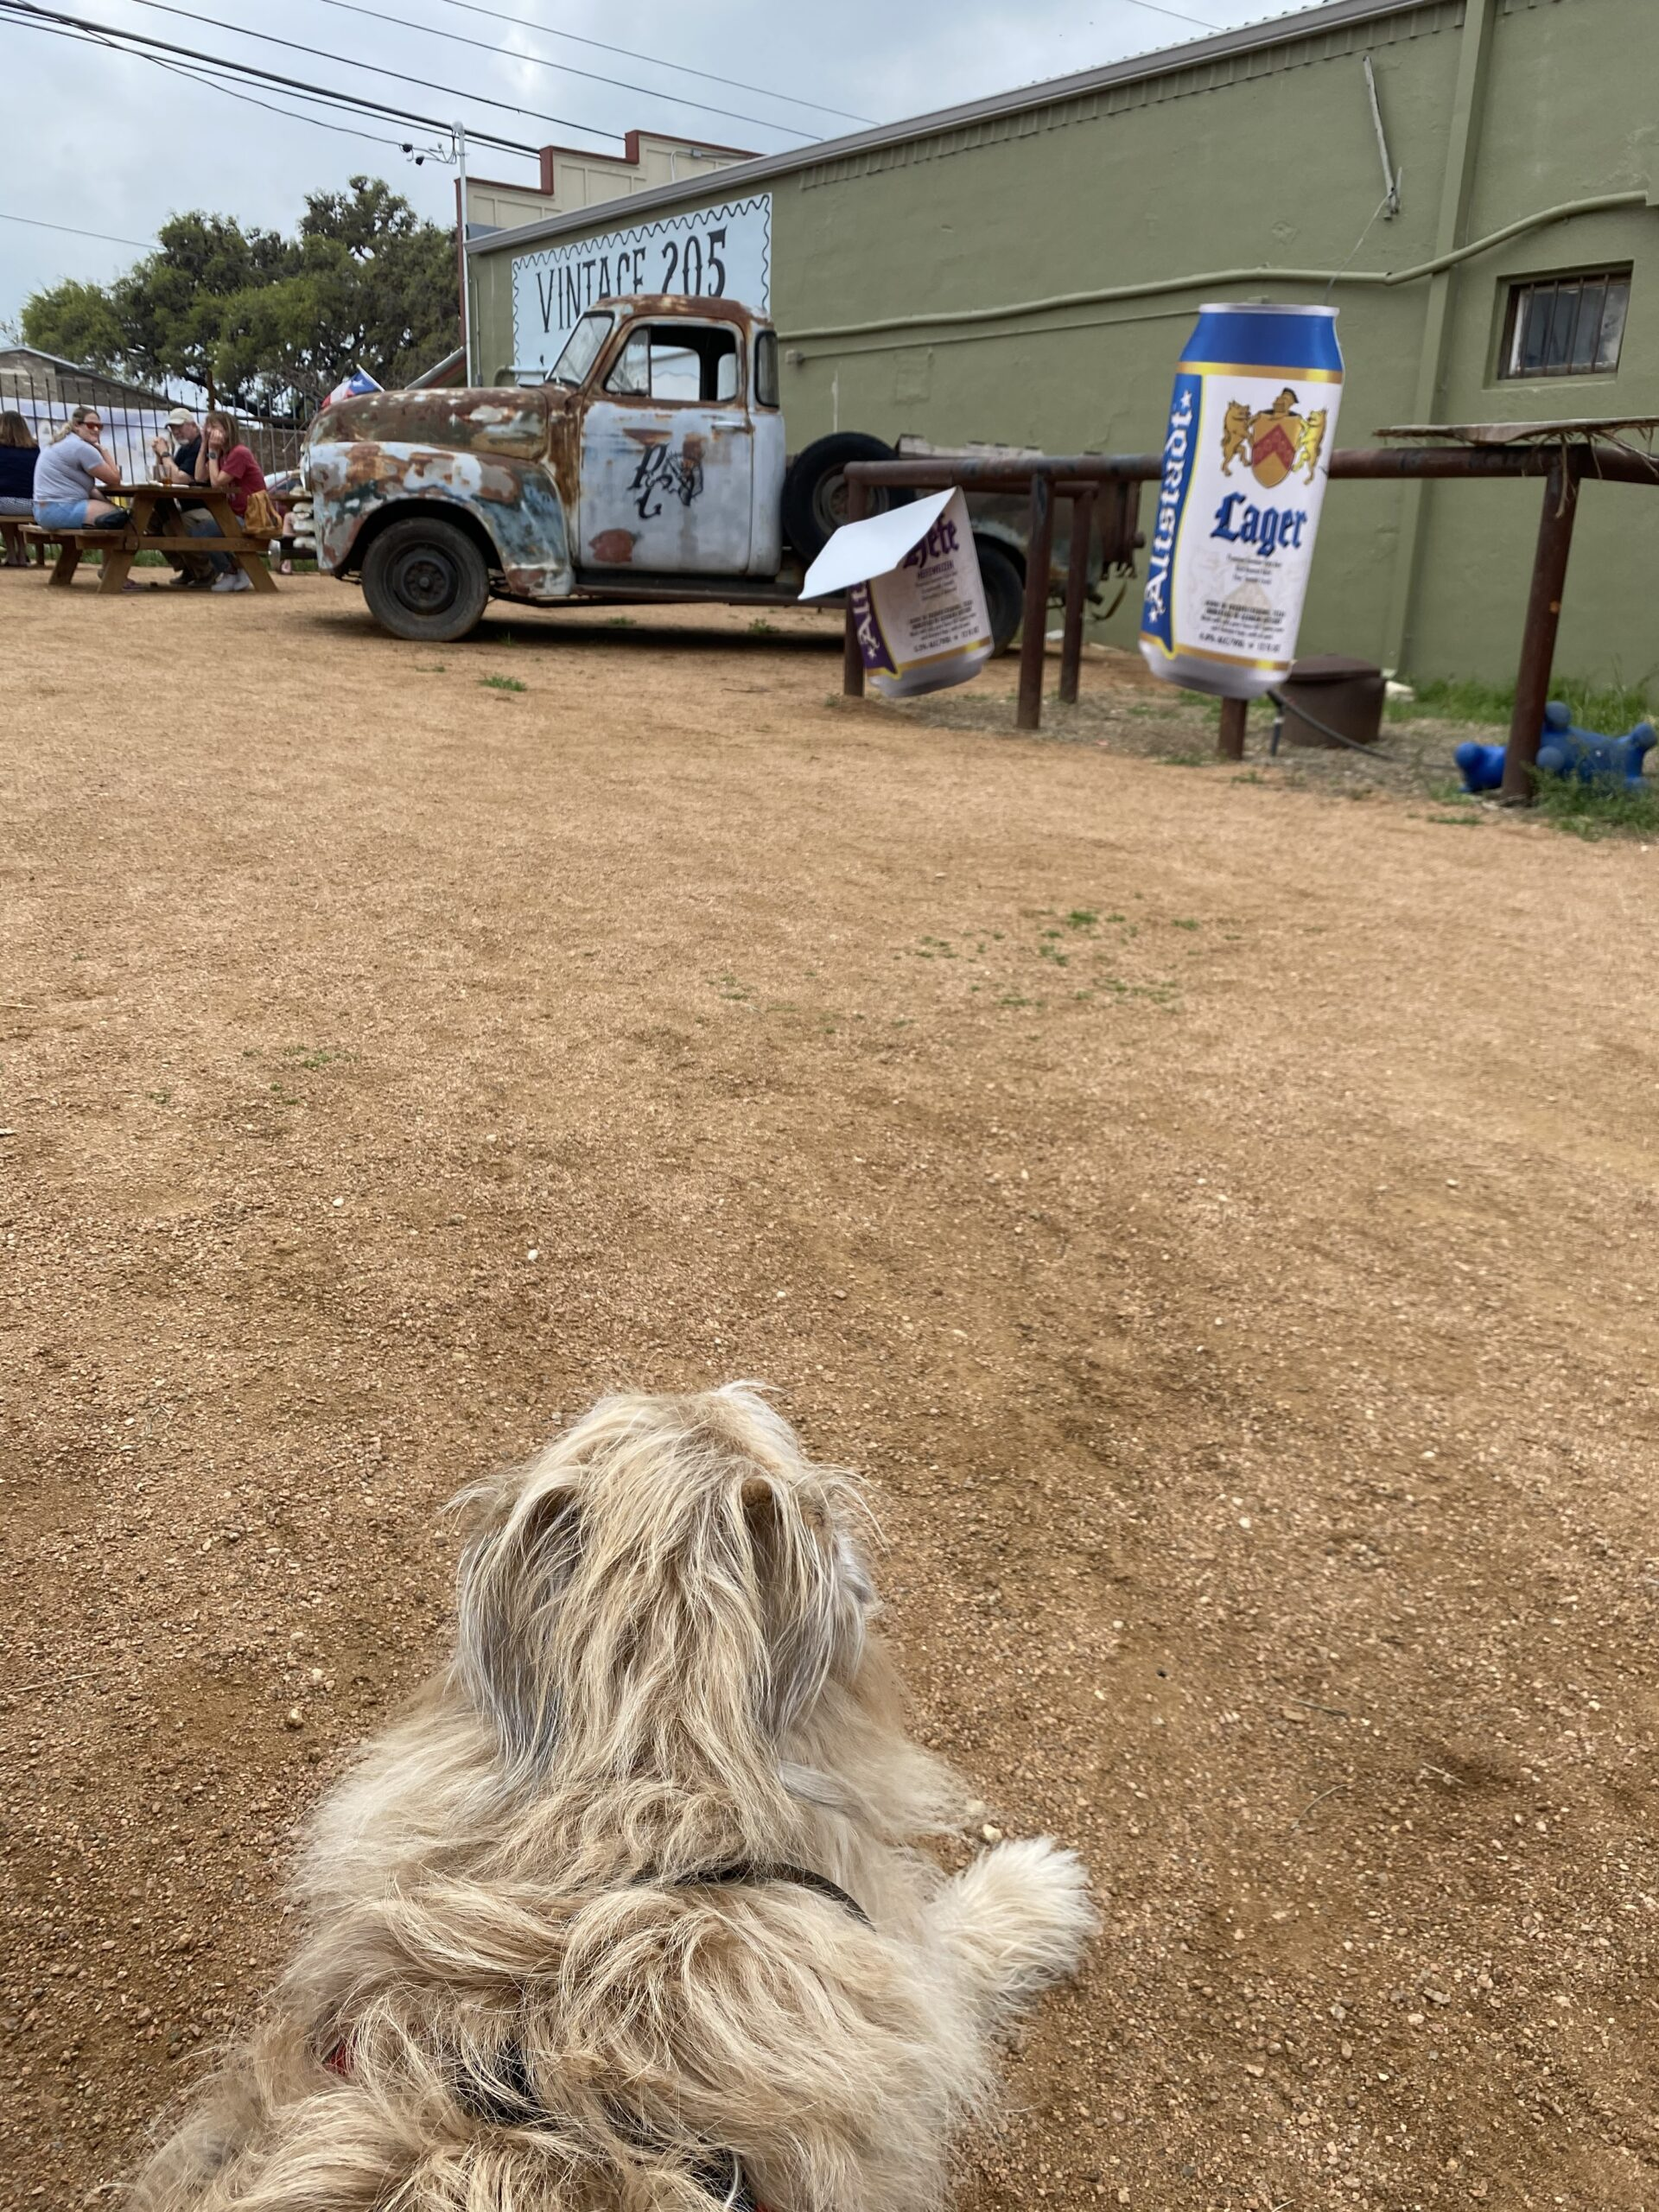 Dog lounging at outdoor bar